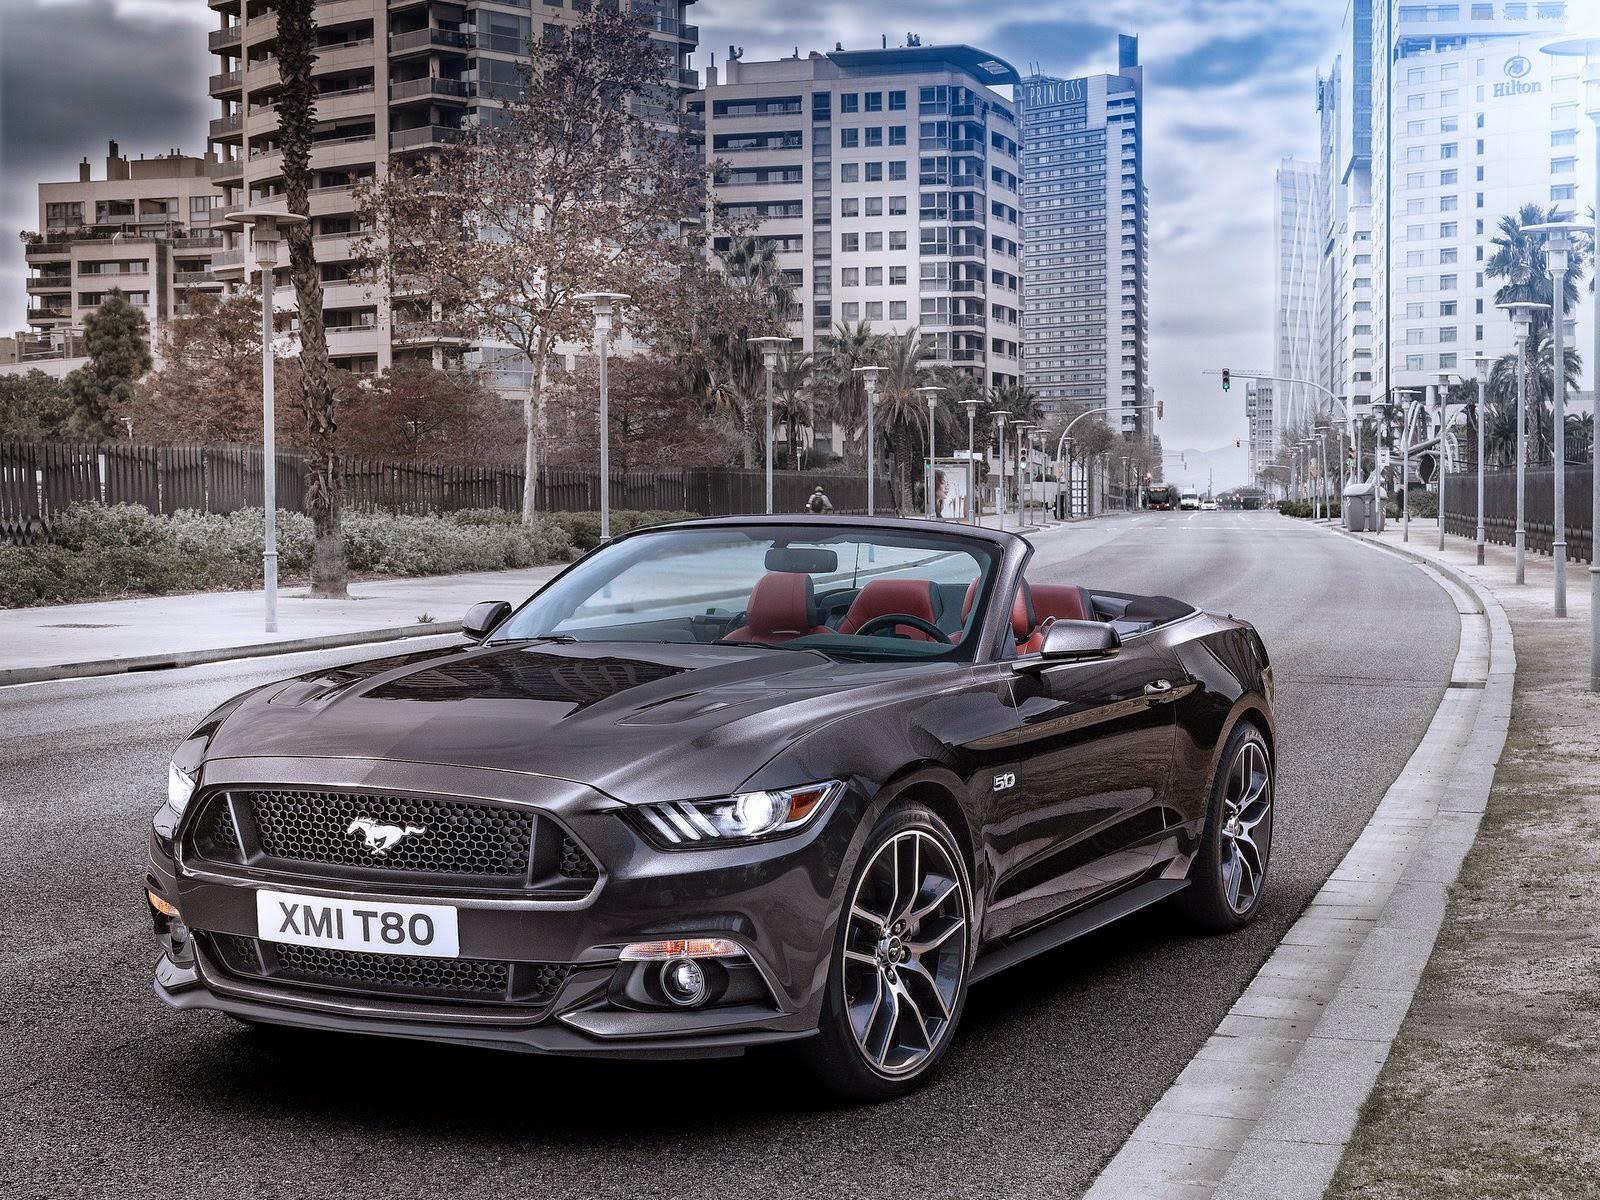 Ford Mustang Convertible wallpaper 福特野馬桌布 | Free HD Wallpapers